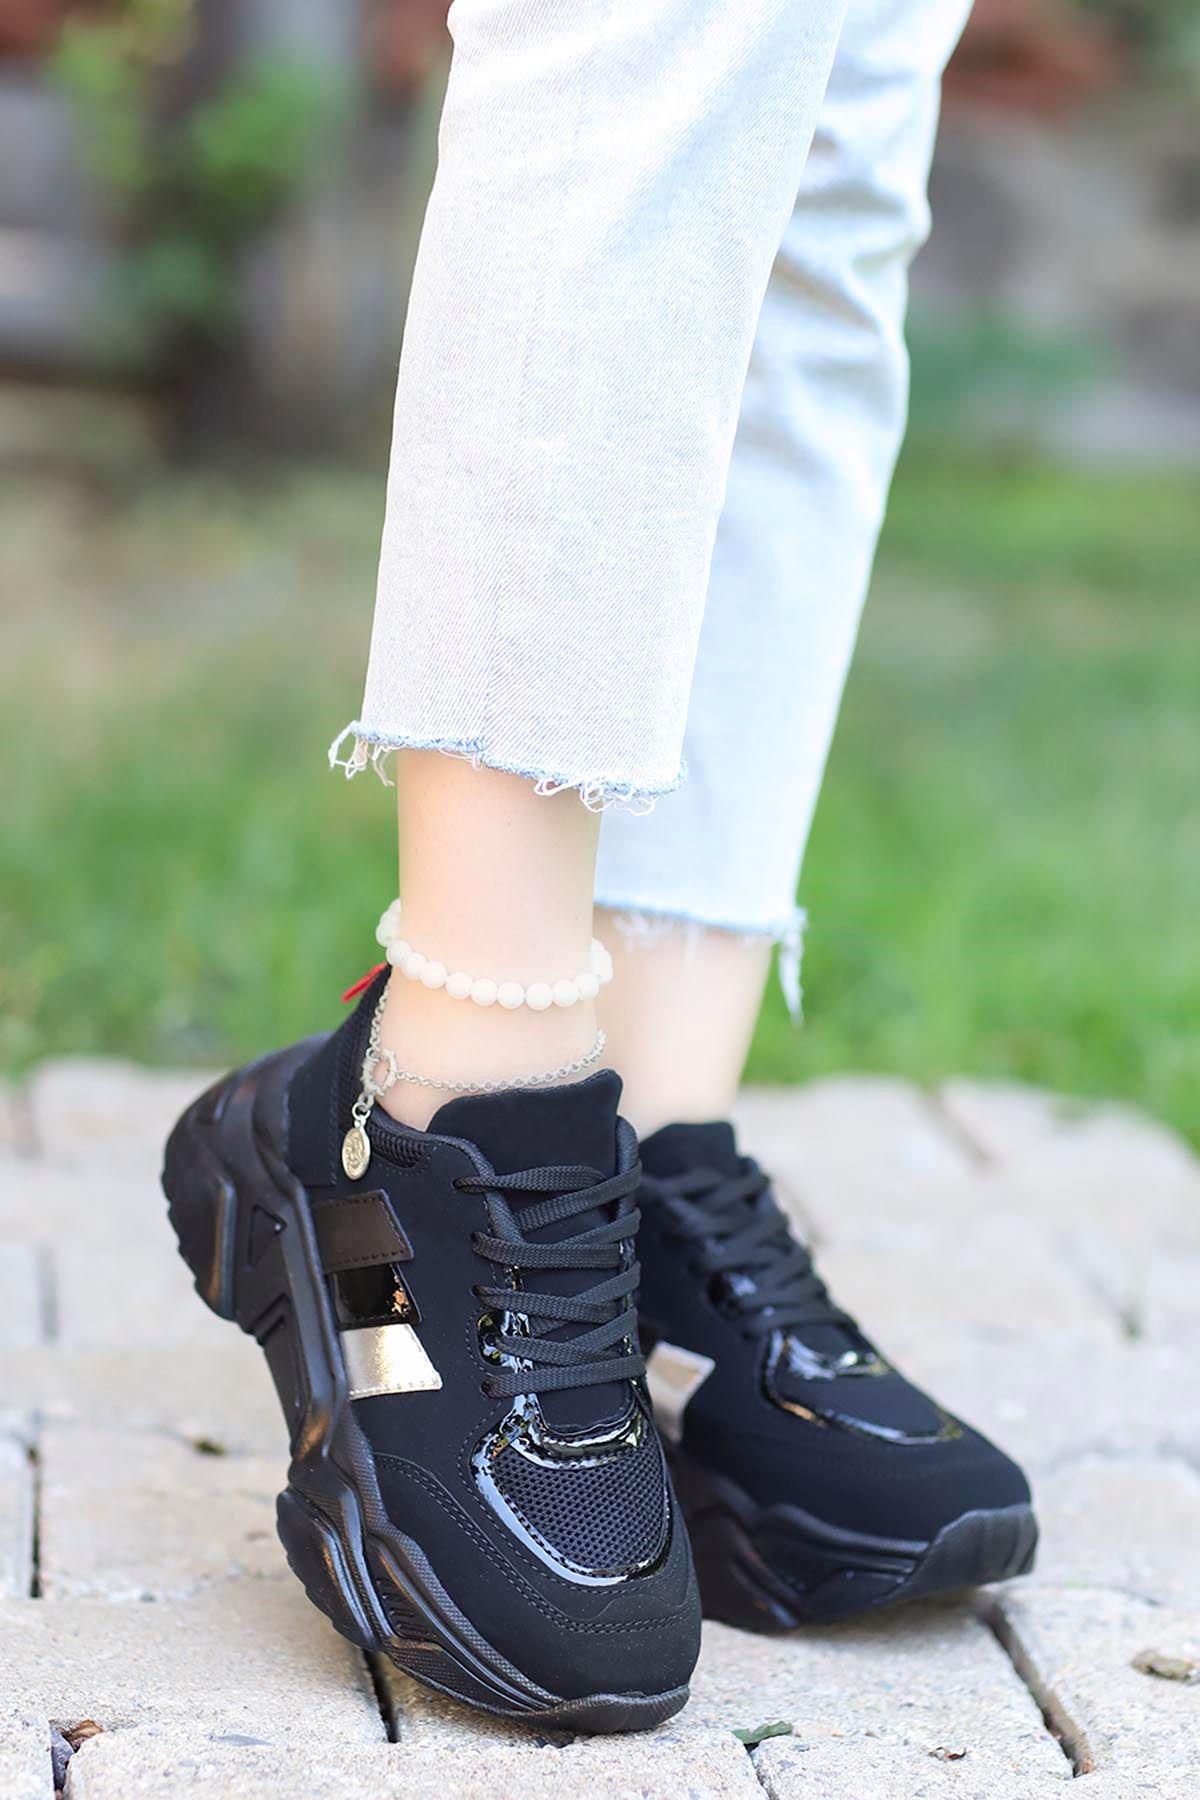 Dali Spor Ayakkabı Siyah Siyah Taban